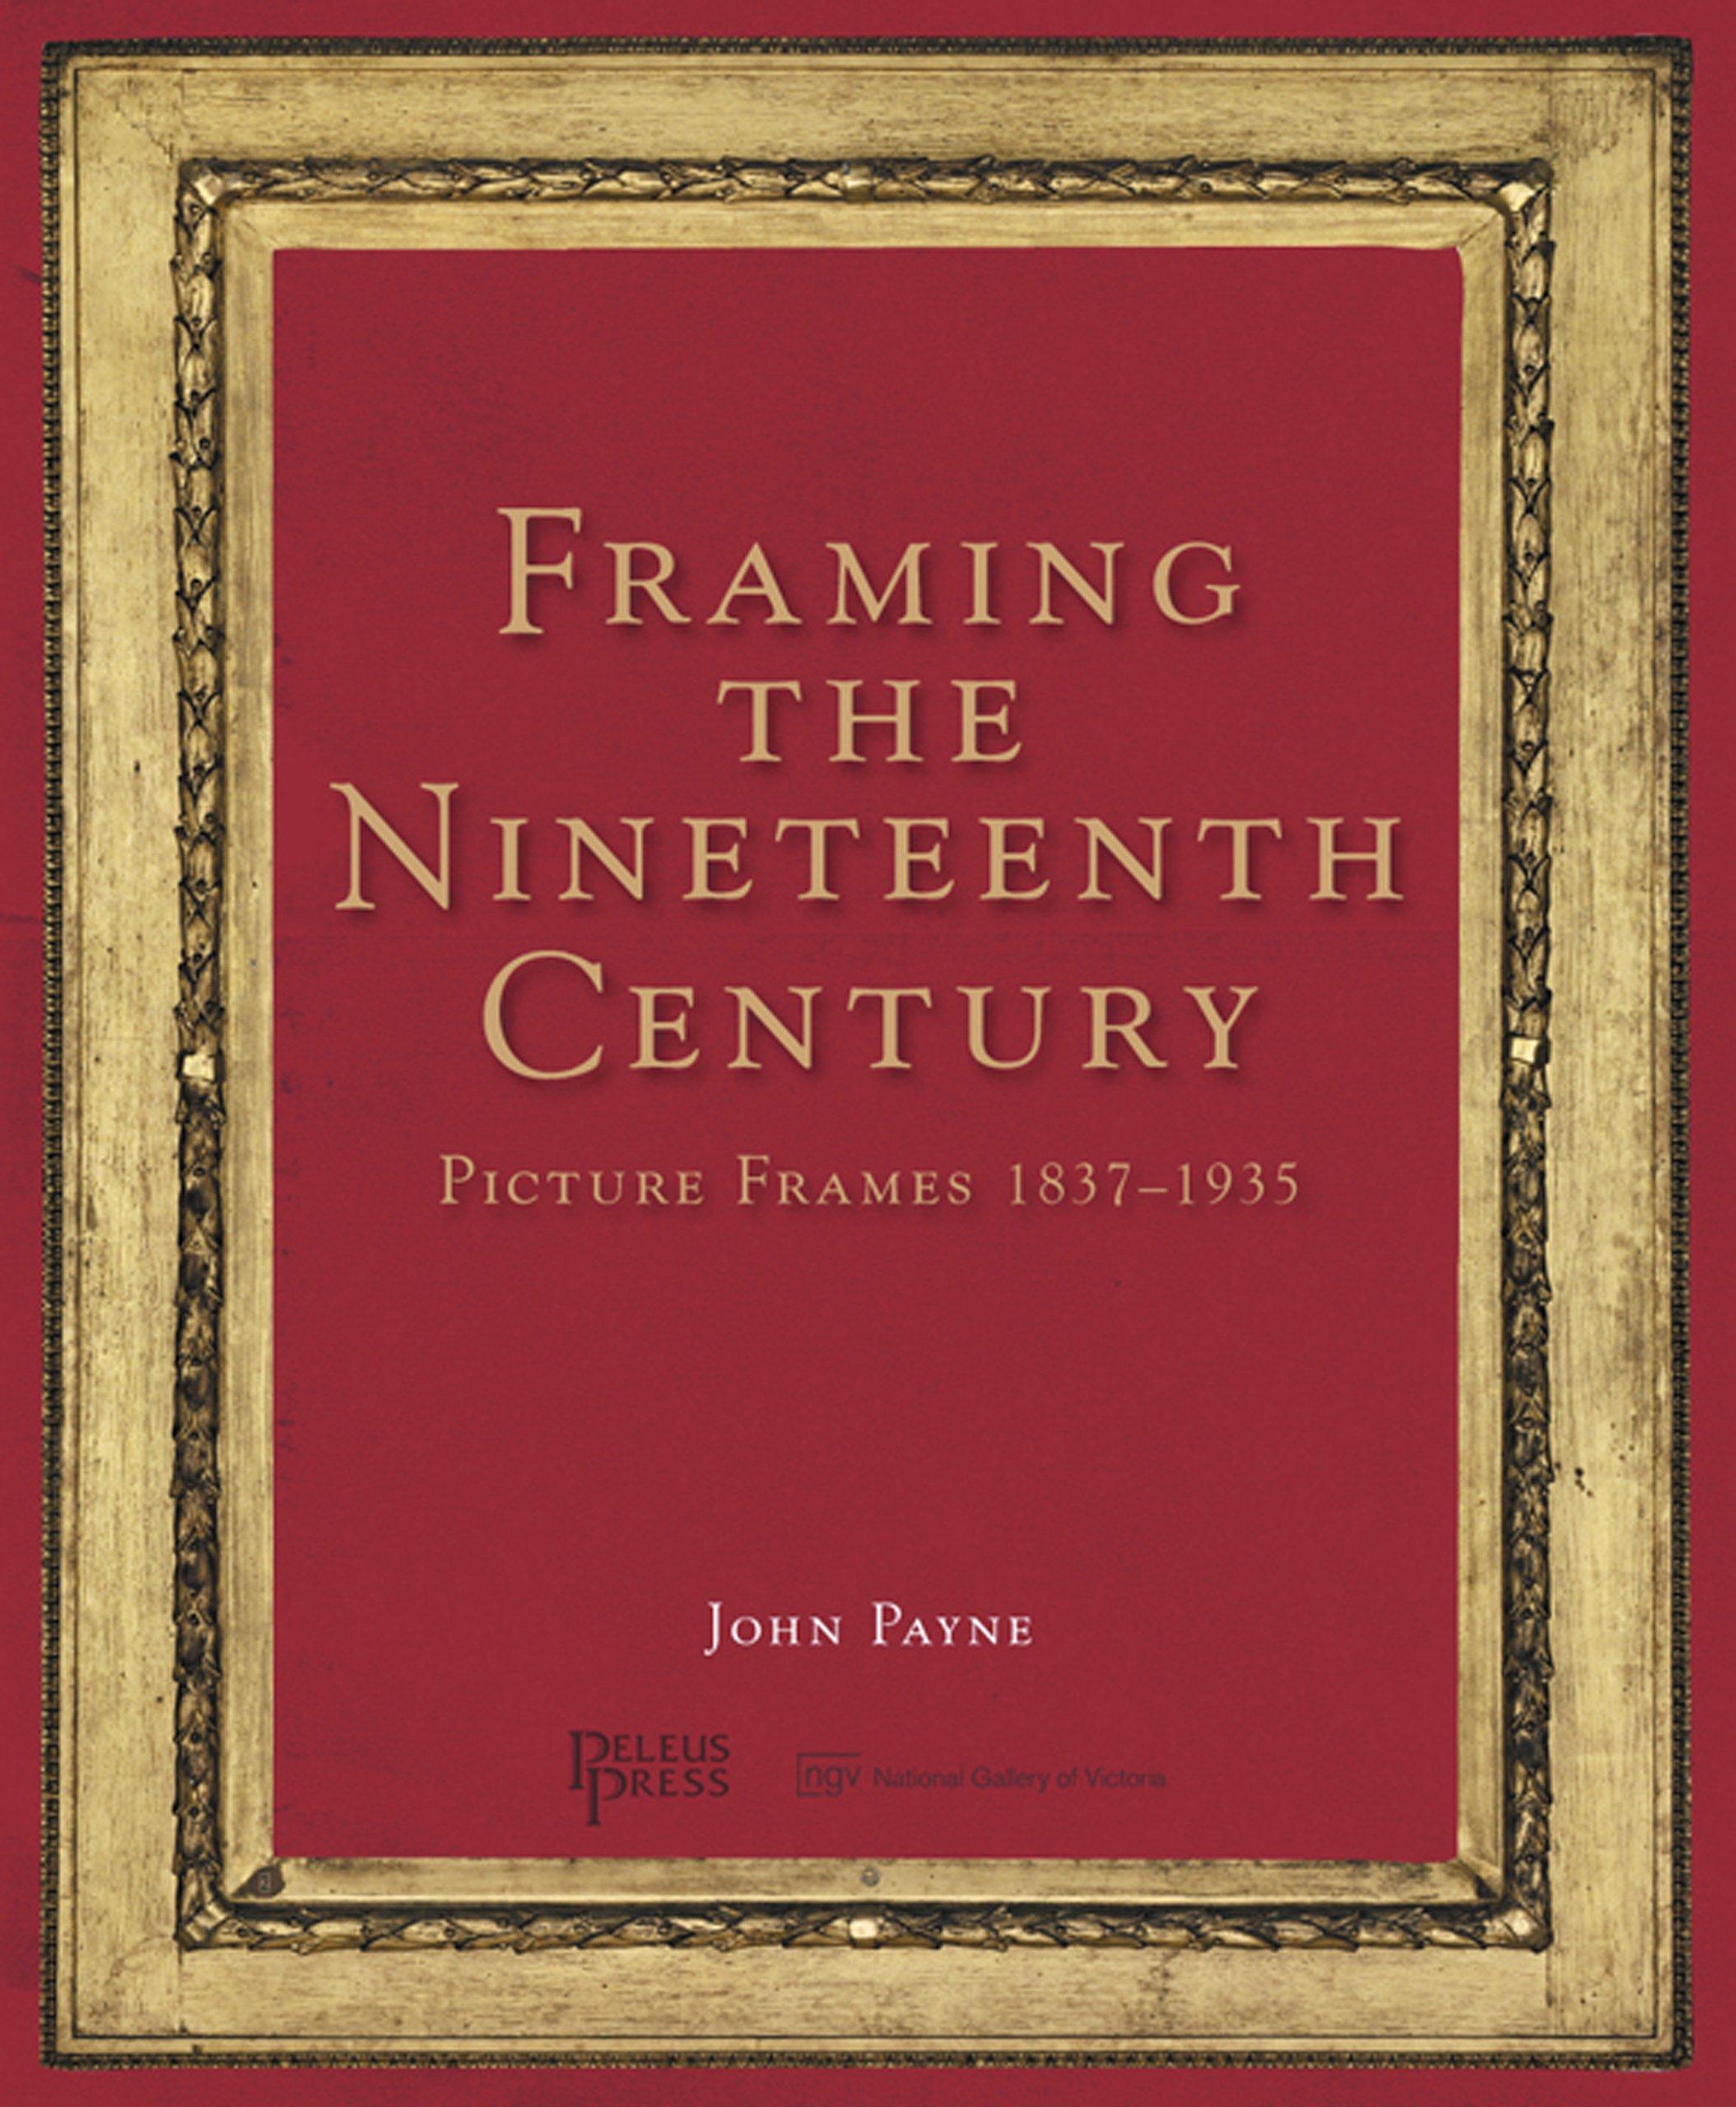 Framing the Nineteenth Century